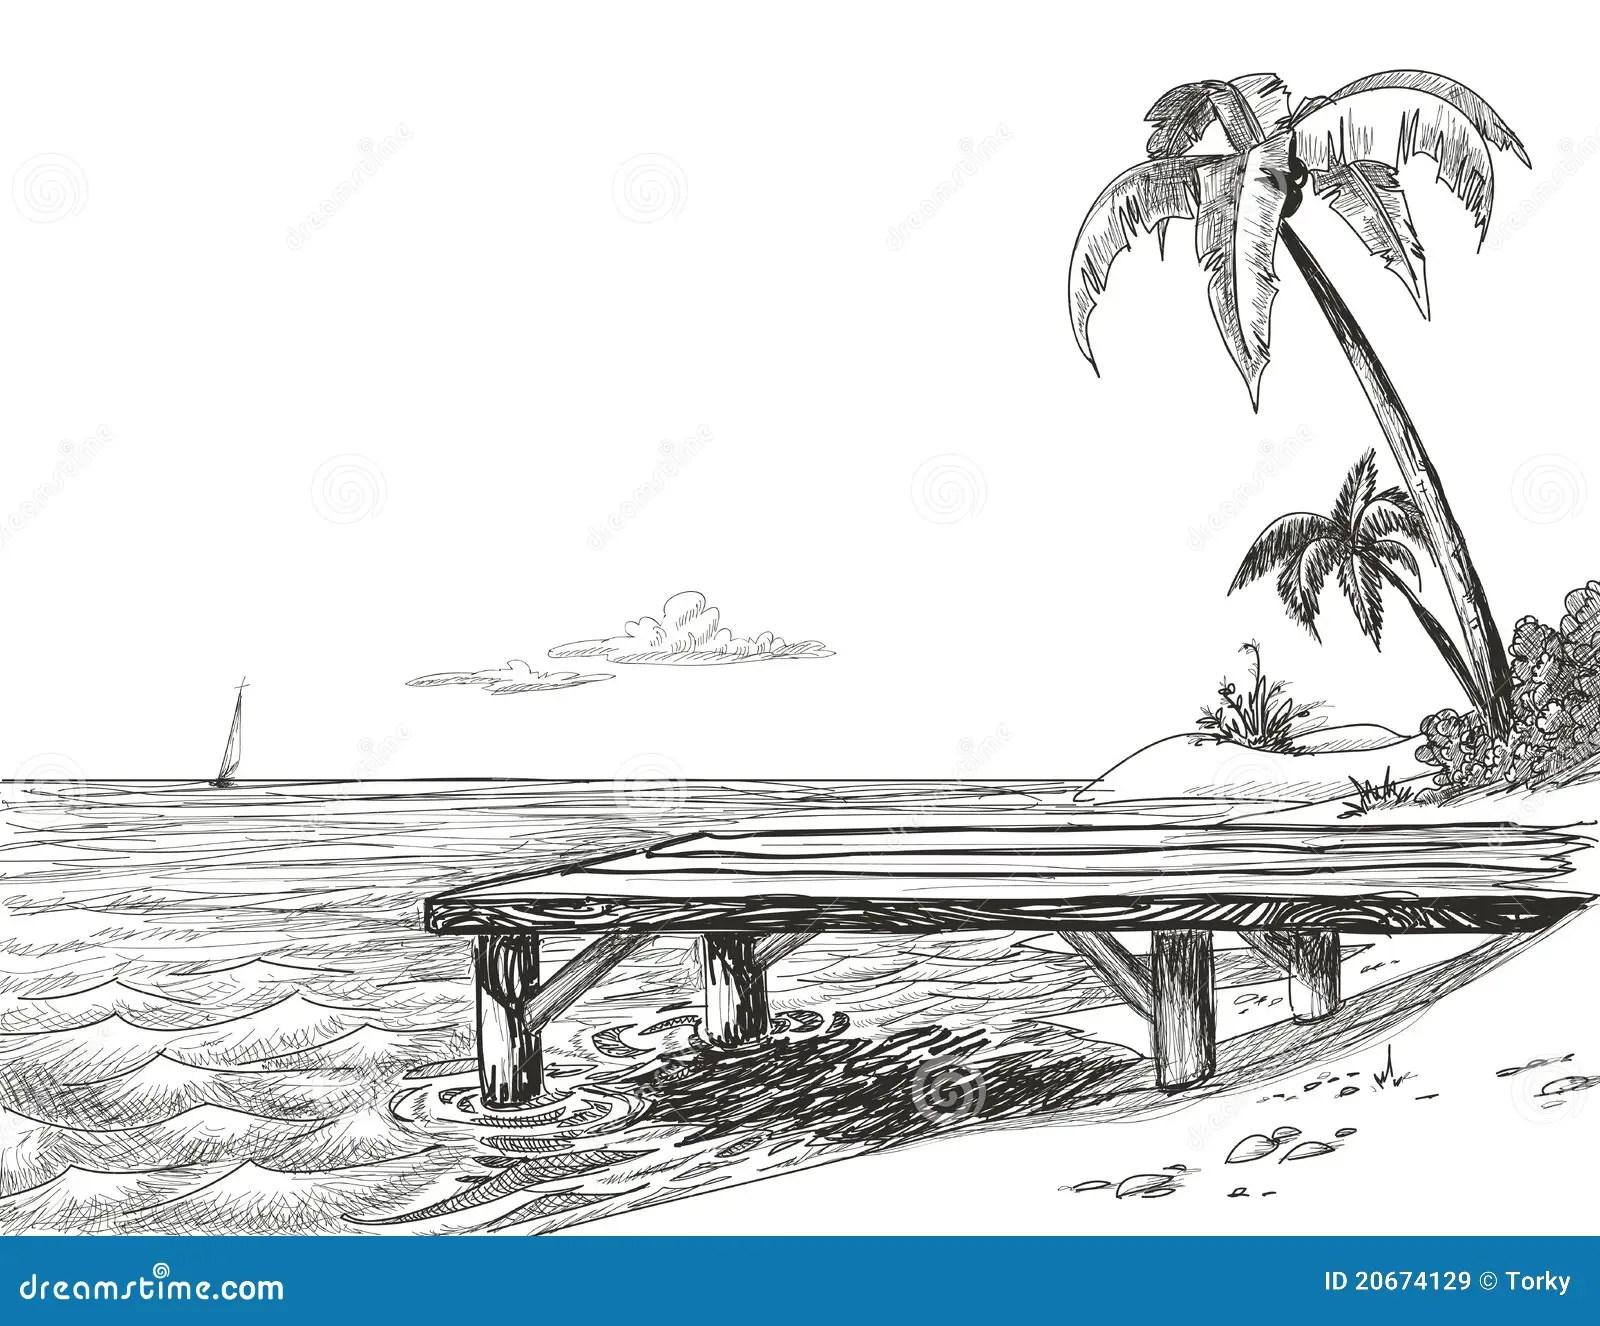 Beach Sketch Stock Vector Illustration Of Coco Harbor